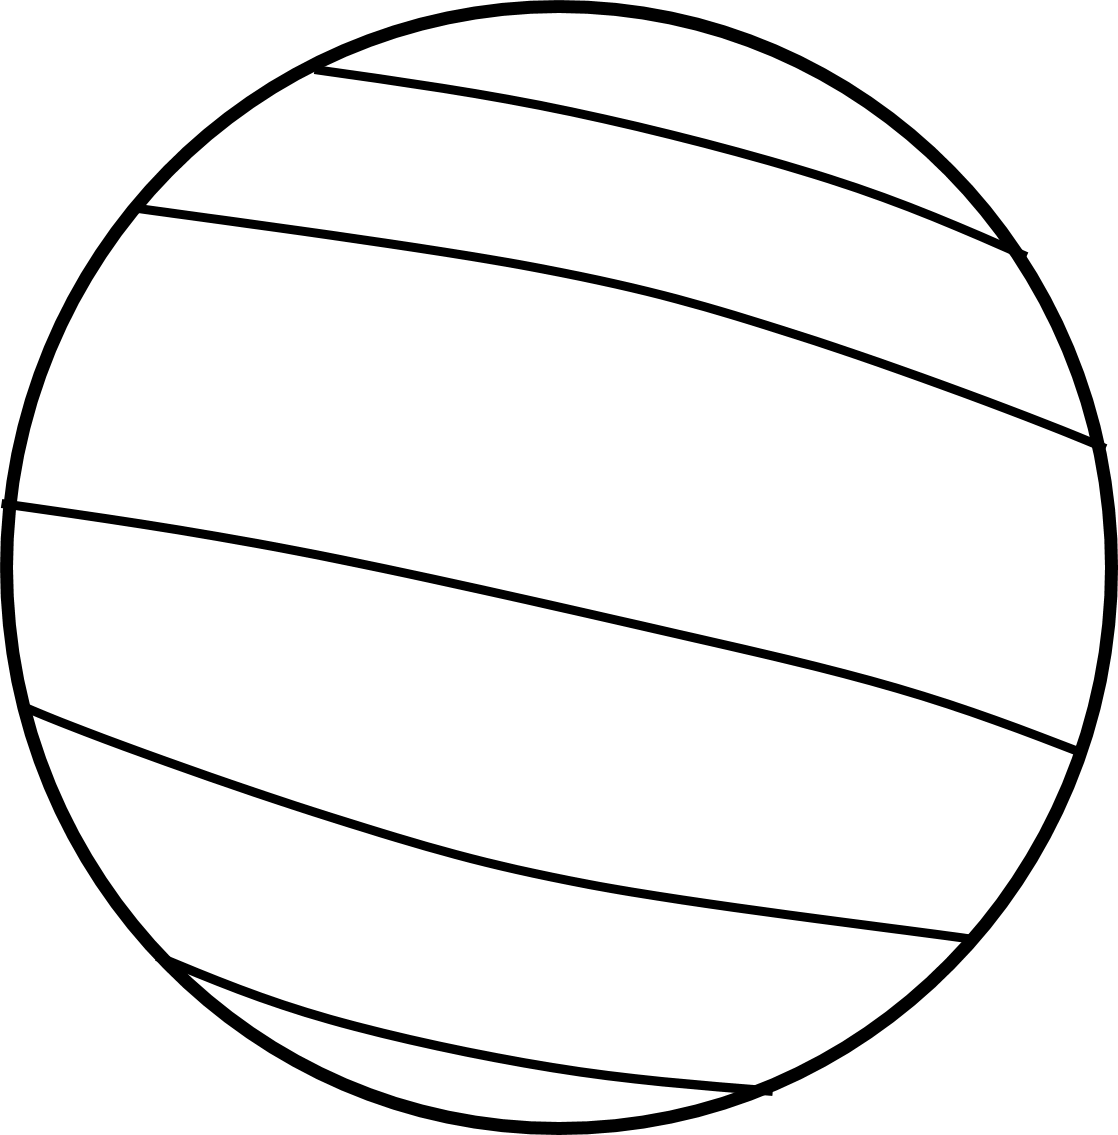 Planet clipart outline.  amazing marble black